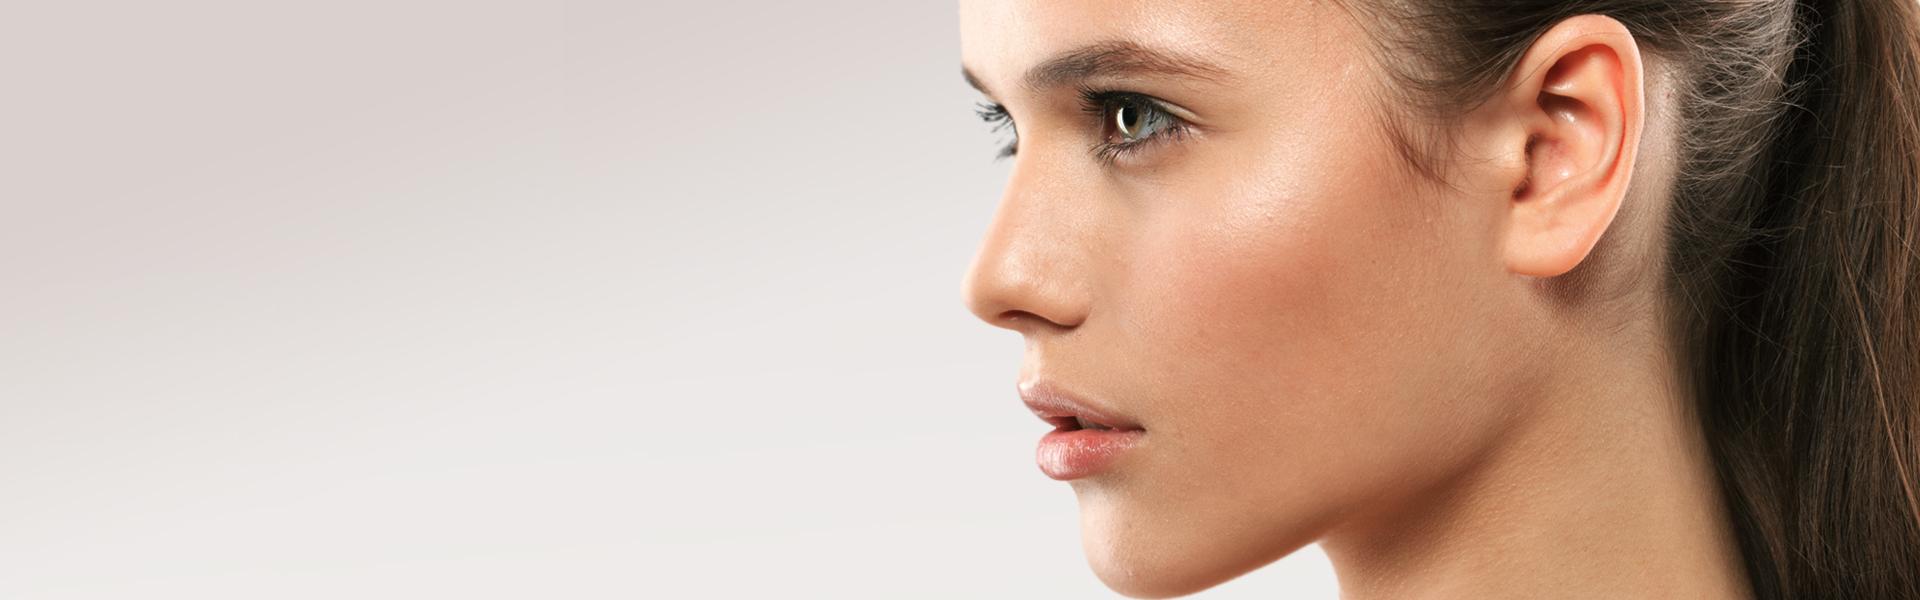 Facial scar treatment brampton toronto photos 260